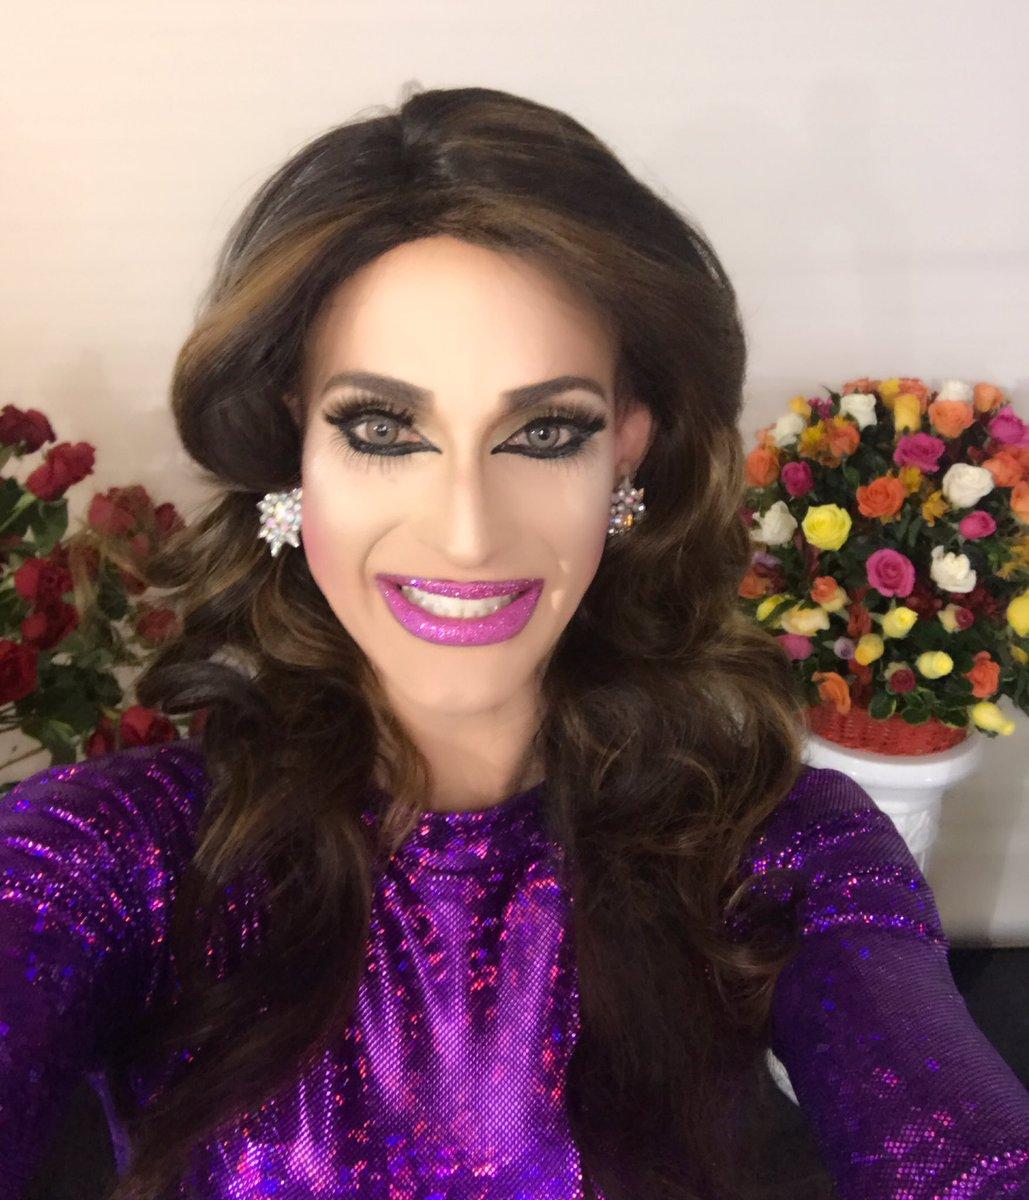 Last night @ #festivallatino in Lima , Peru . Love you miss amores honoring Nubeluz tv show !#blessed #latinamerica #cucu #nubeluz<br>http://pic.twitter.com/PSVFdugUEx